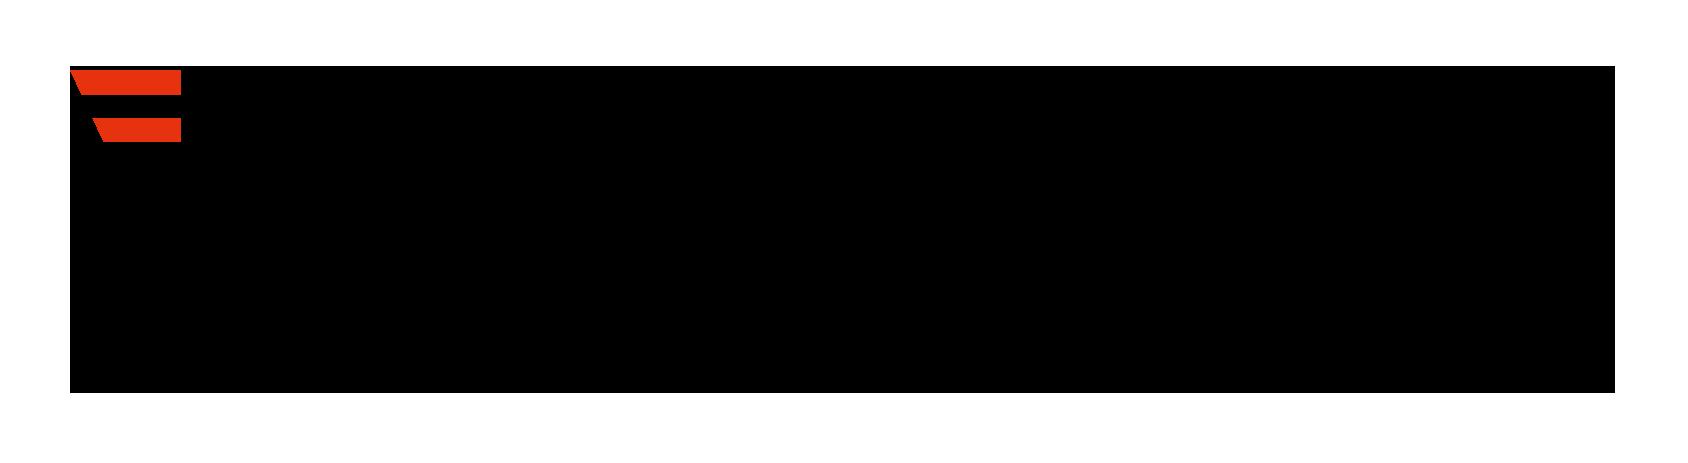 bka-fj-sitelogo-330breit